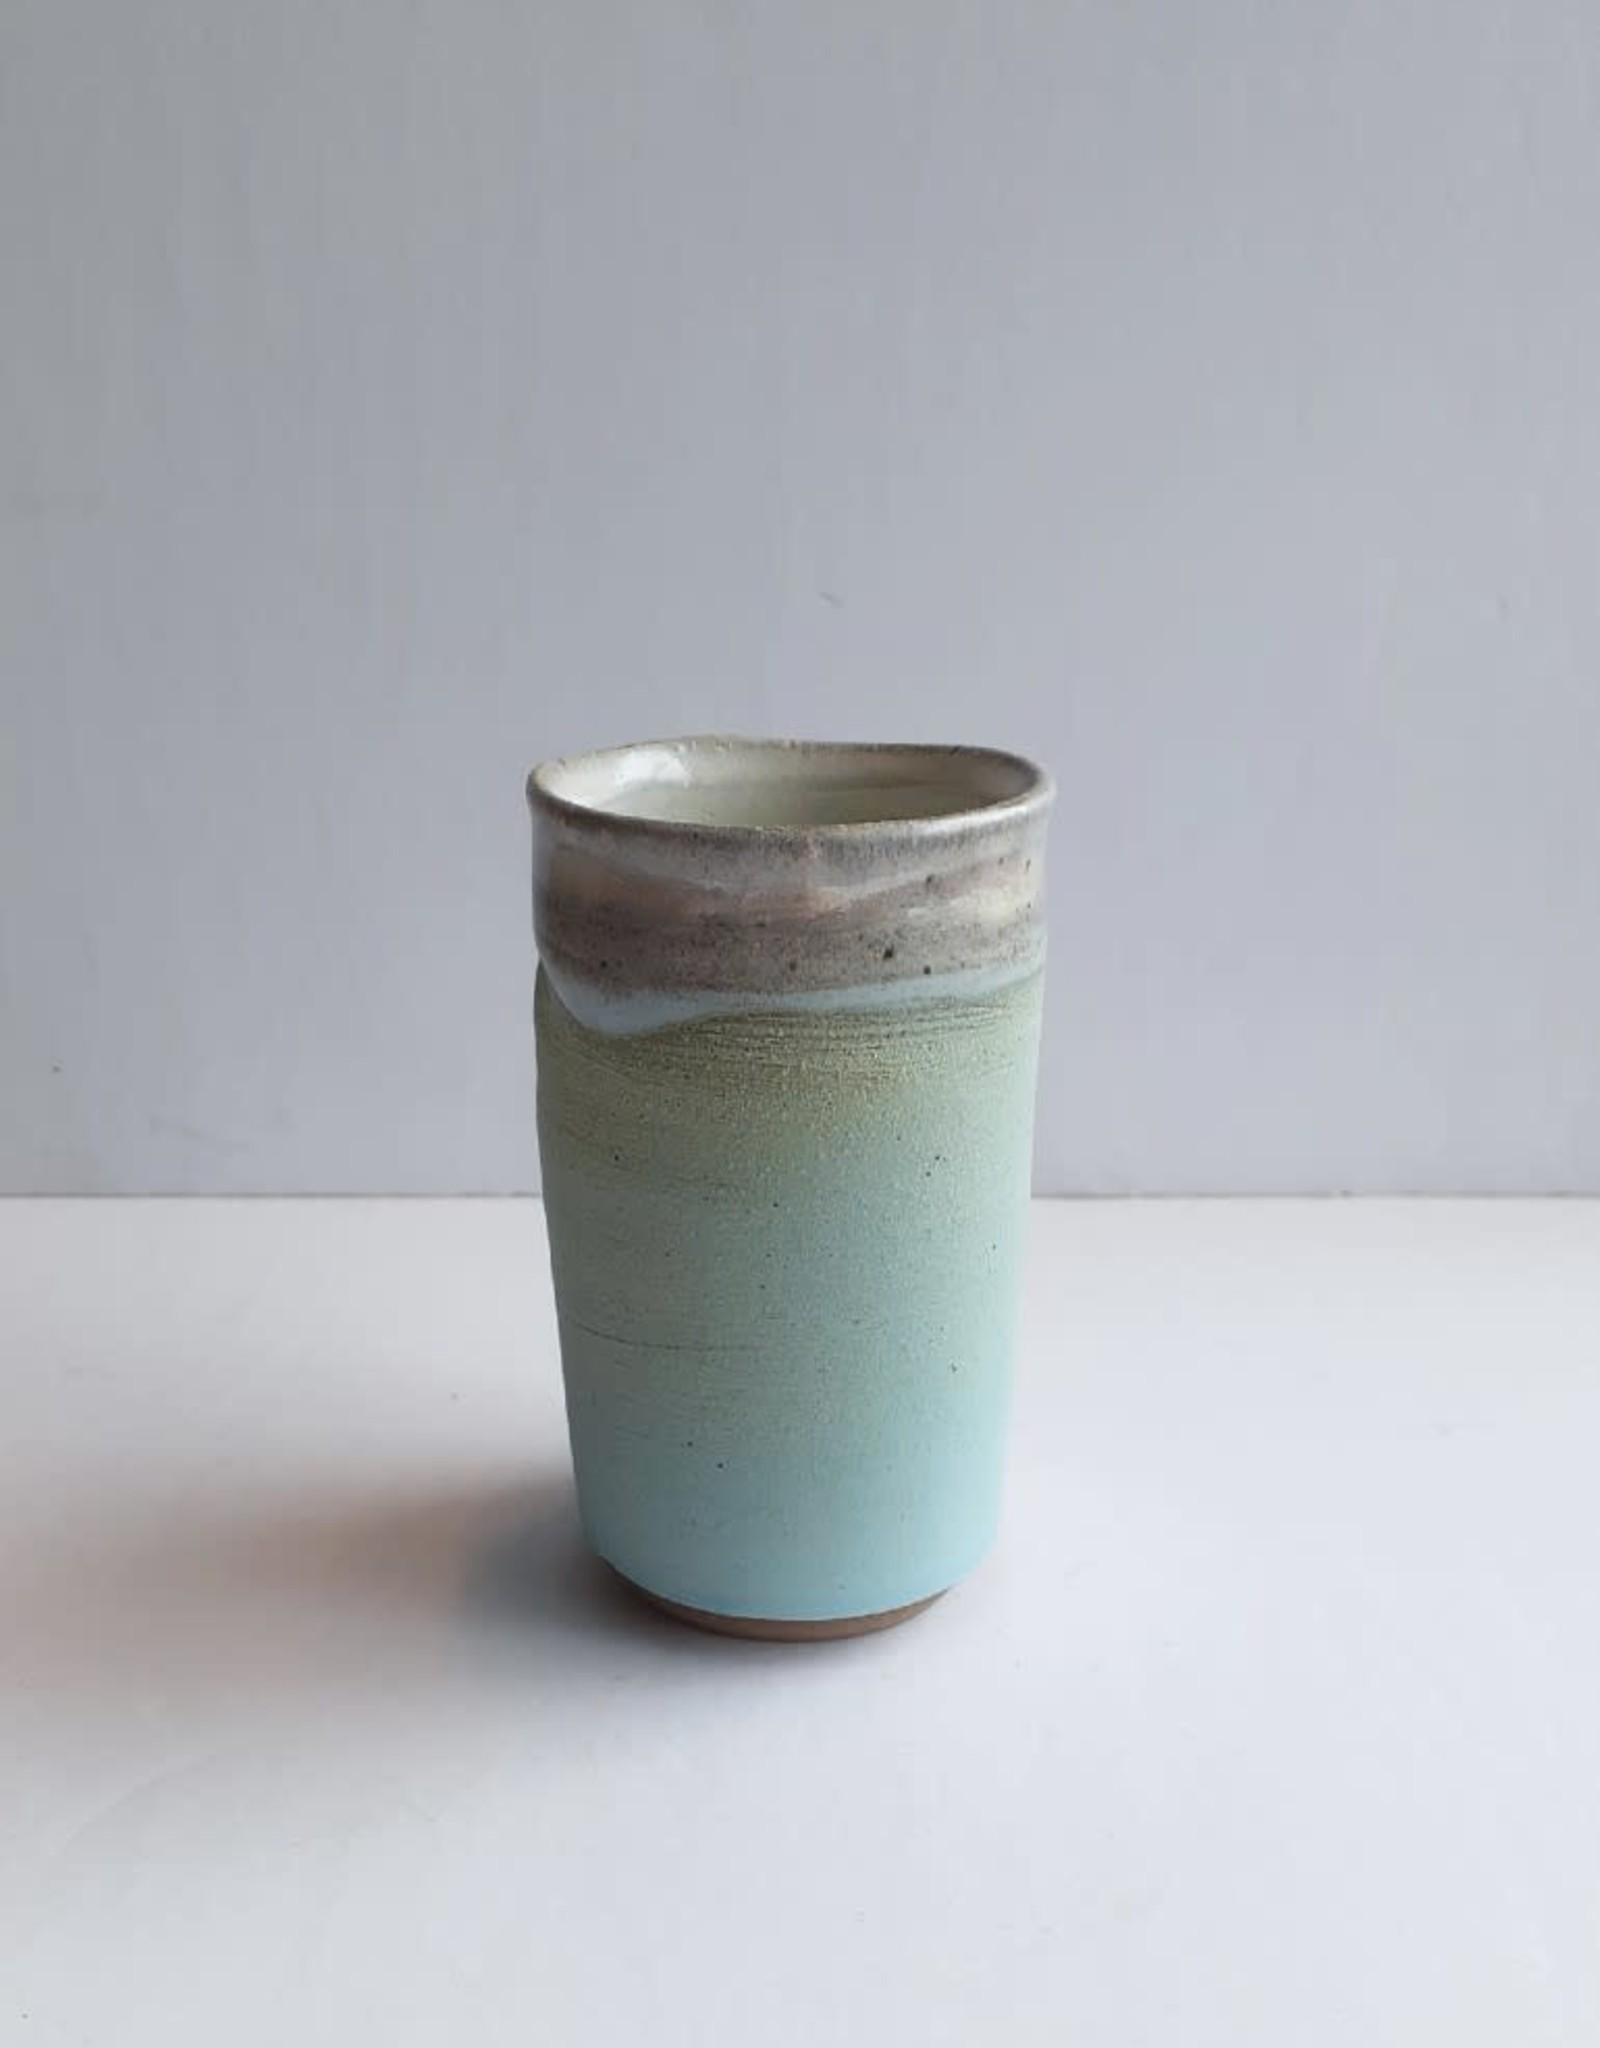 Jacinthe Brind'Amour Mini Vase 3 Jacinthe Brind'Amour